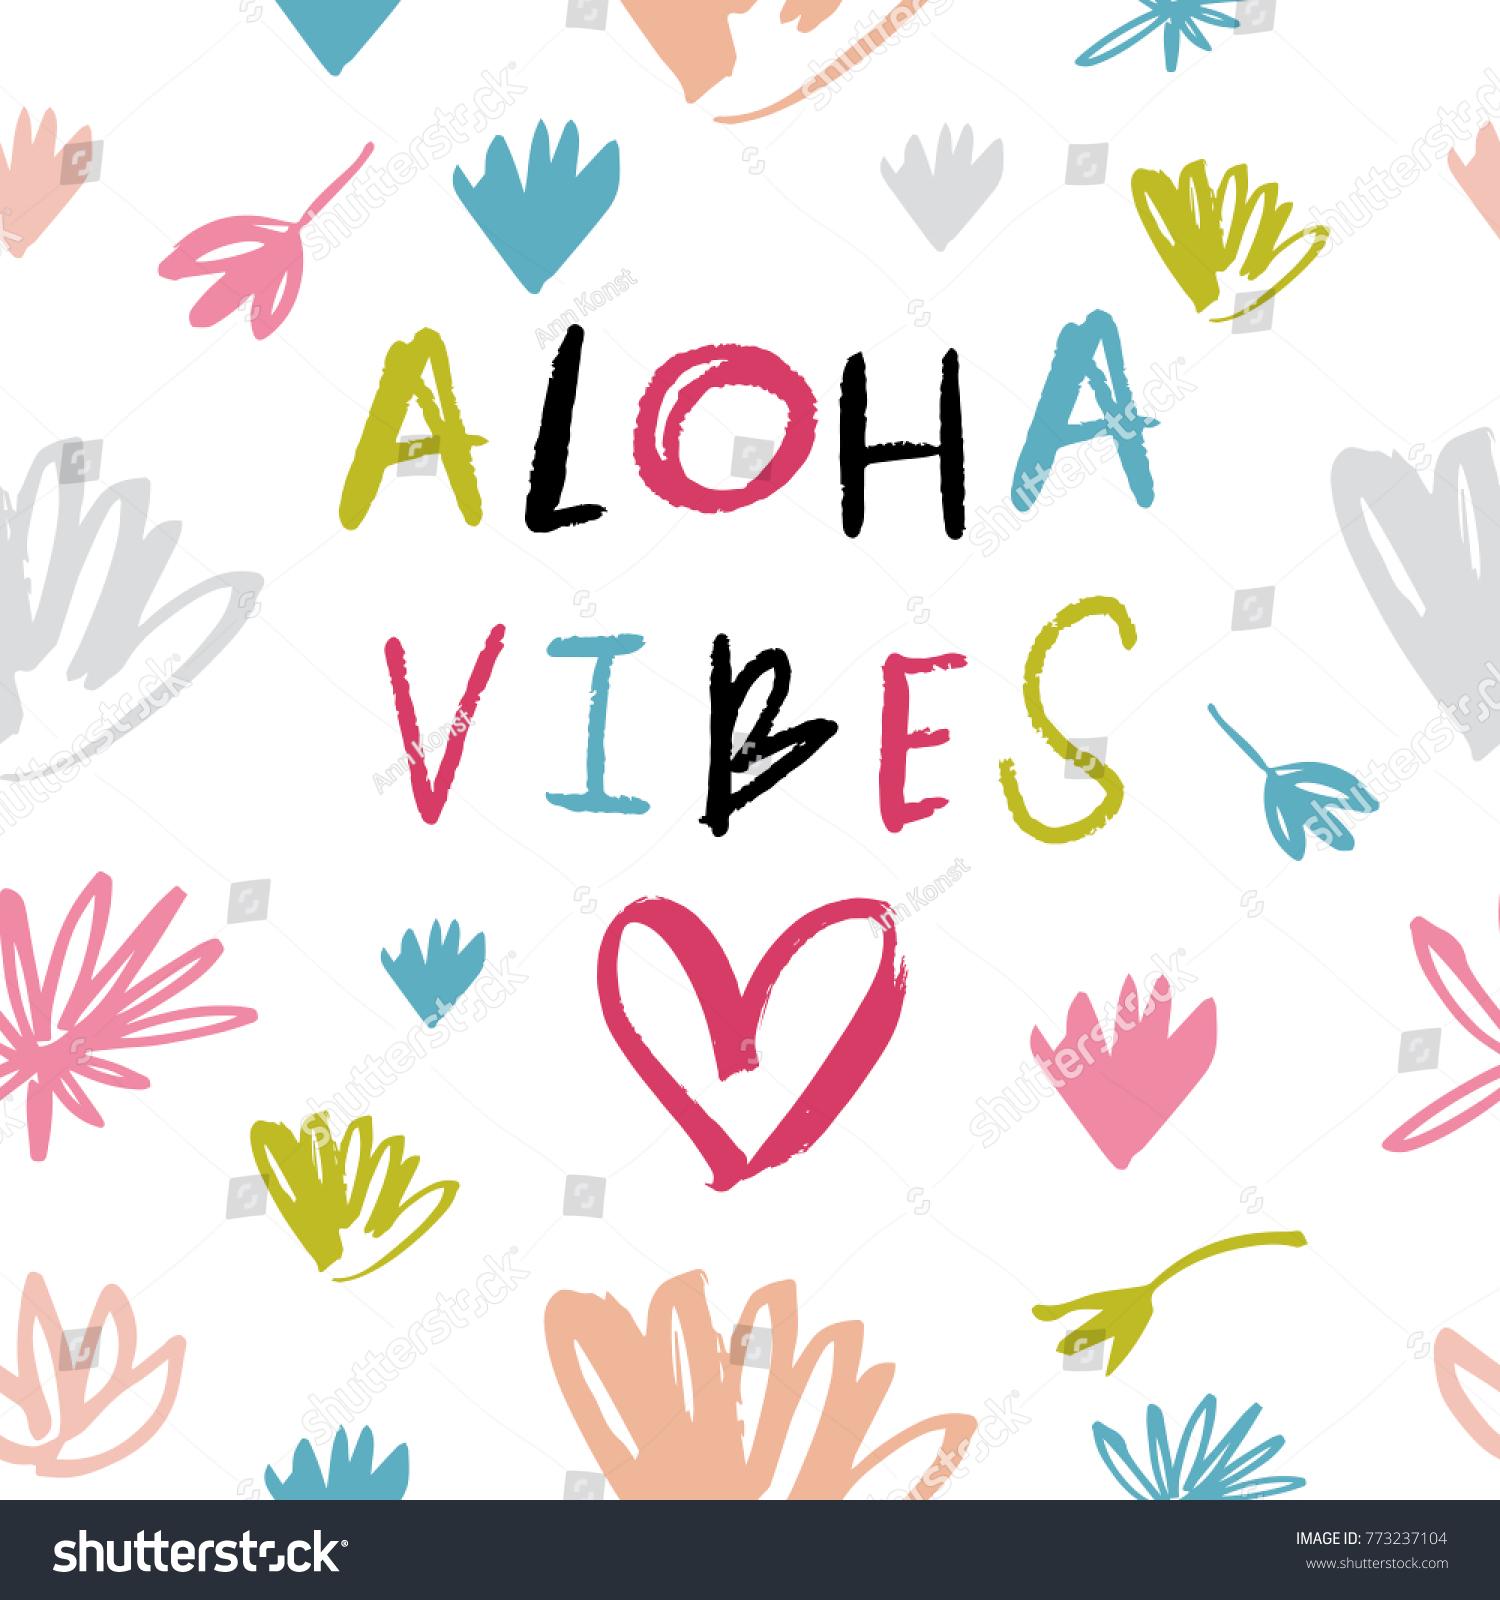 vector clip art hand drawn pattern stock vector 773237104 shutterstock rh shutterstock com aloha friday clipart aloha clipart free